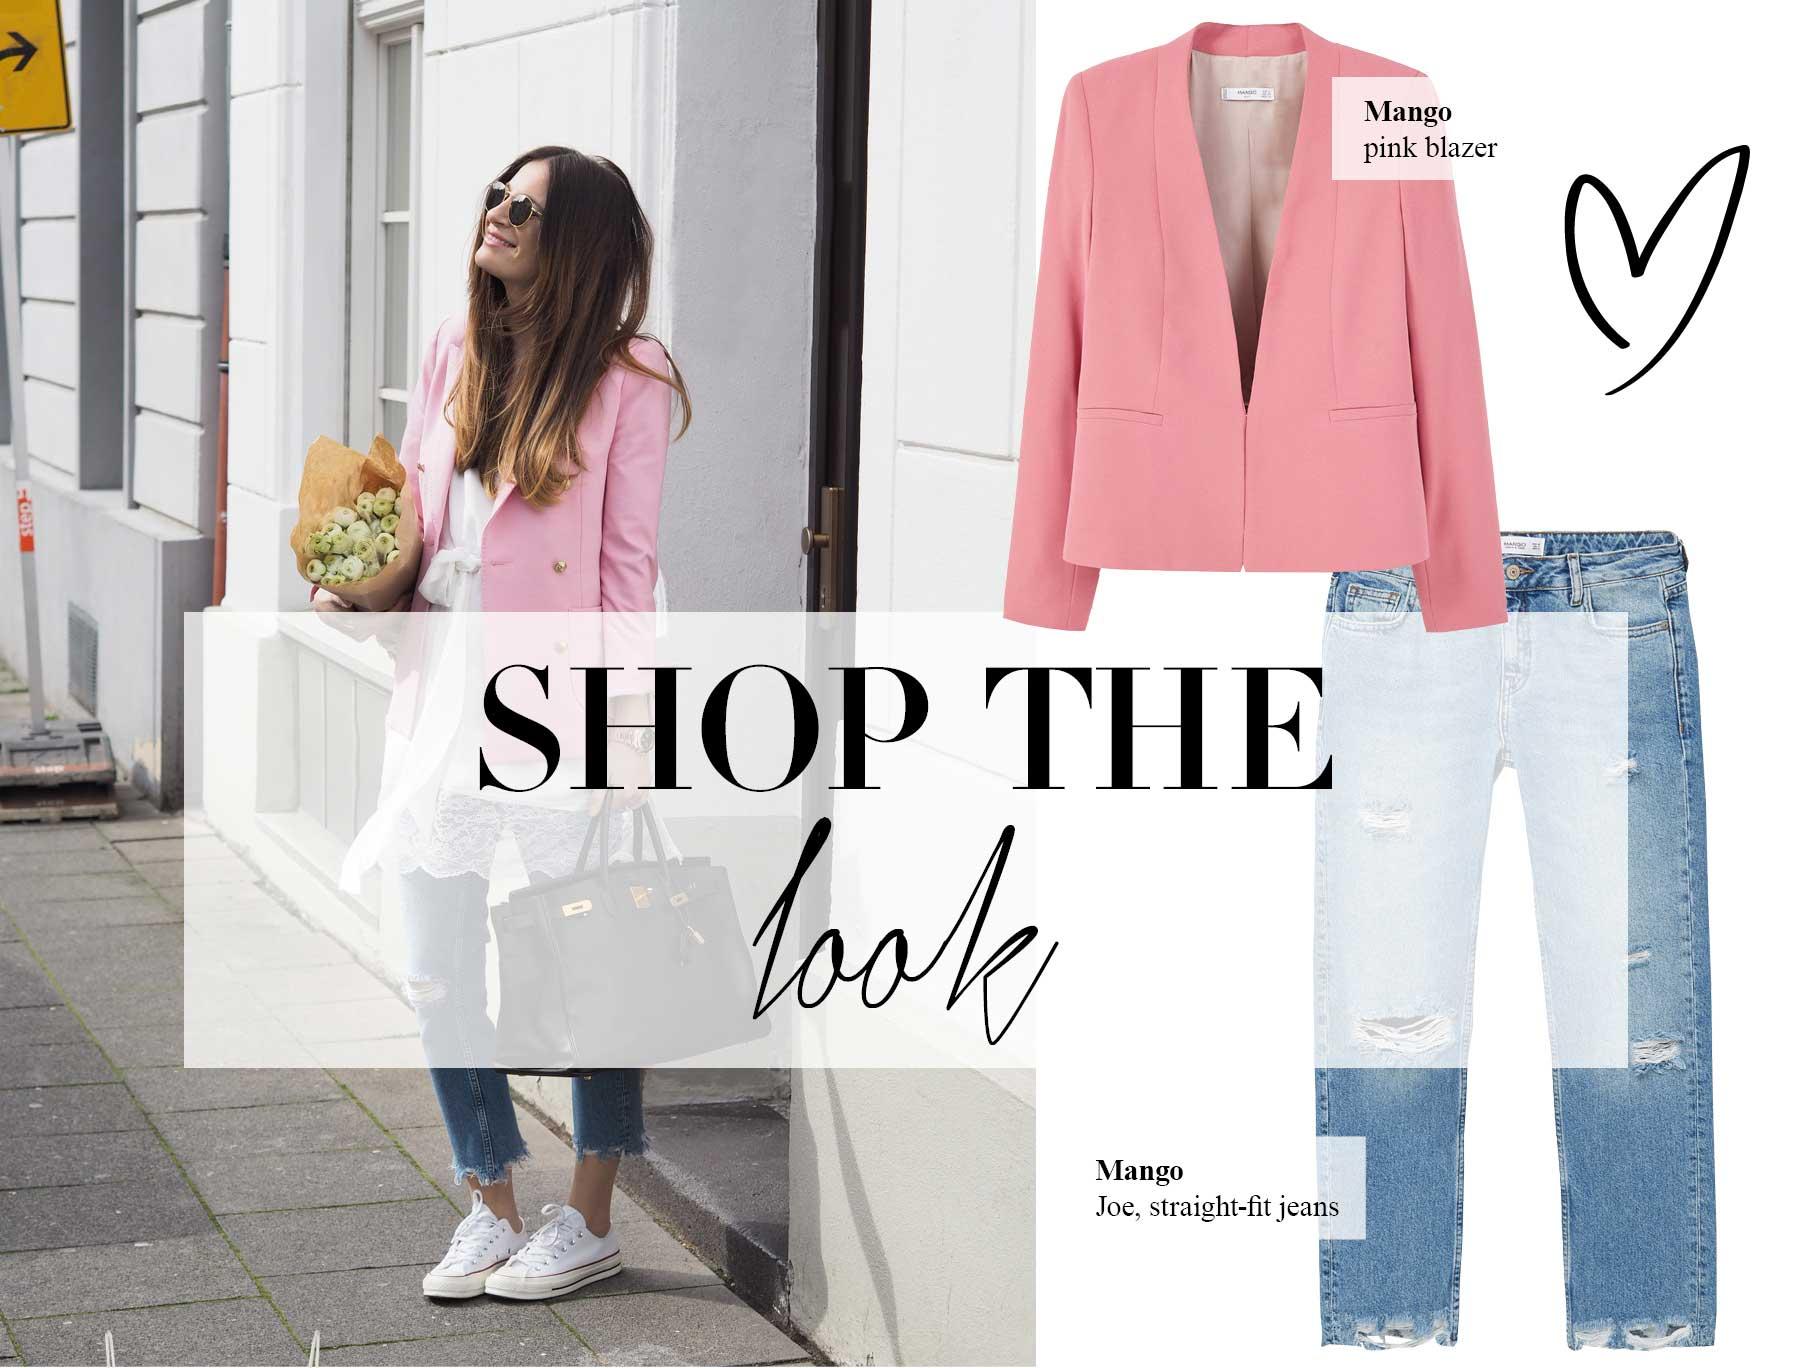 shop the look think pink editorial lena terlutter. Black Bedroom Furniture Sets. Home Design Ideas